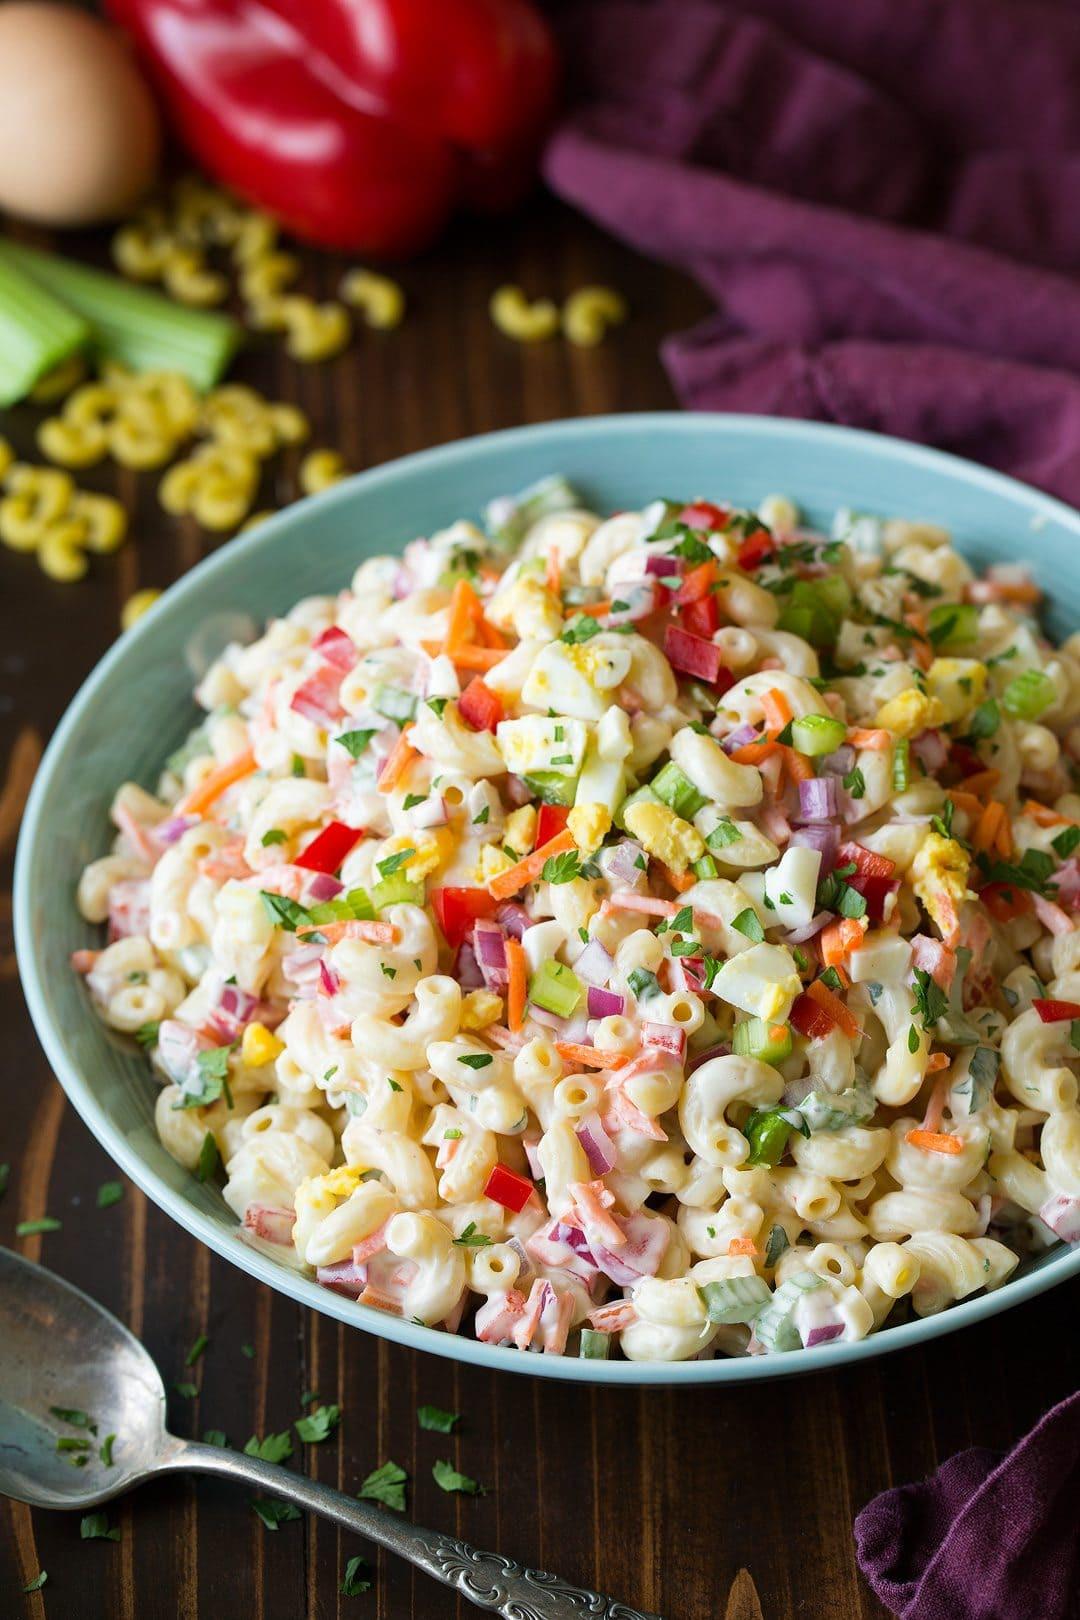 Macaroni Salad With Eggs  Classic Macaroni Salad Easy Go To Side Dish  Cooking